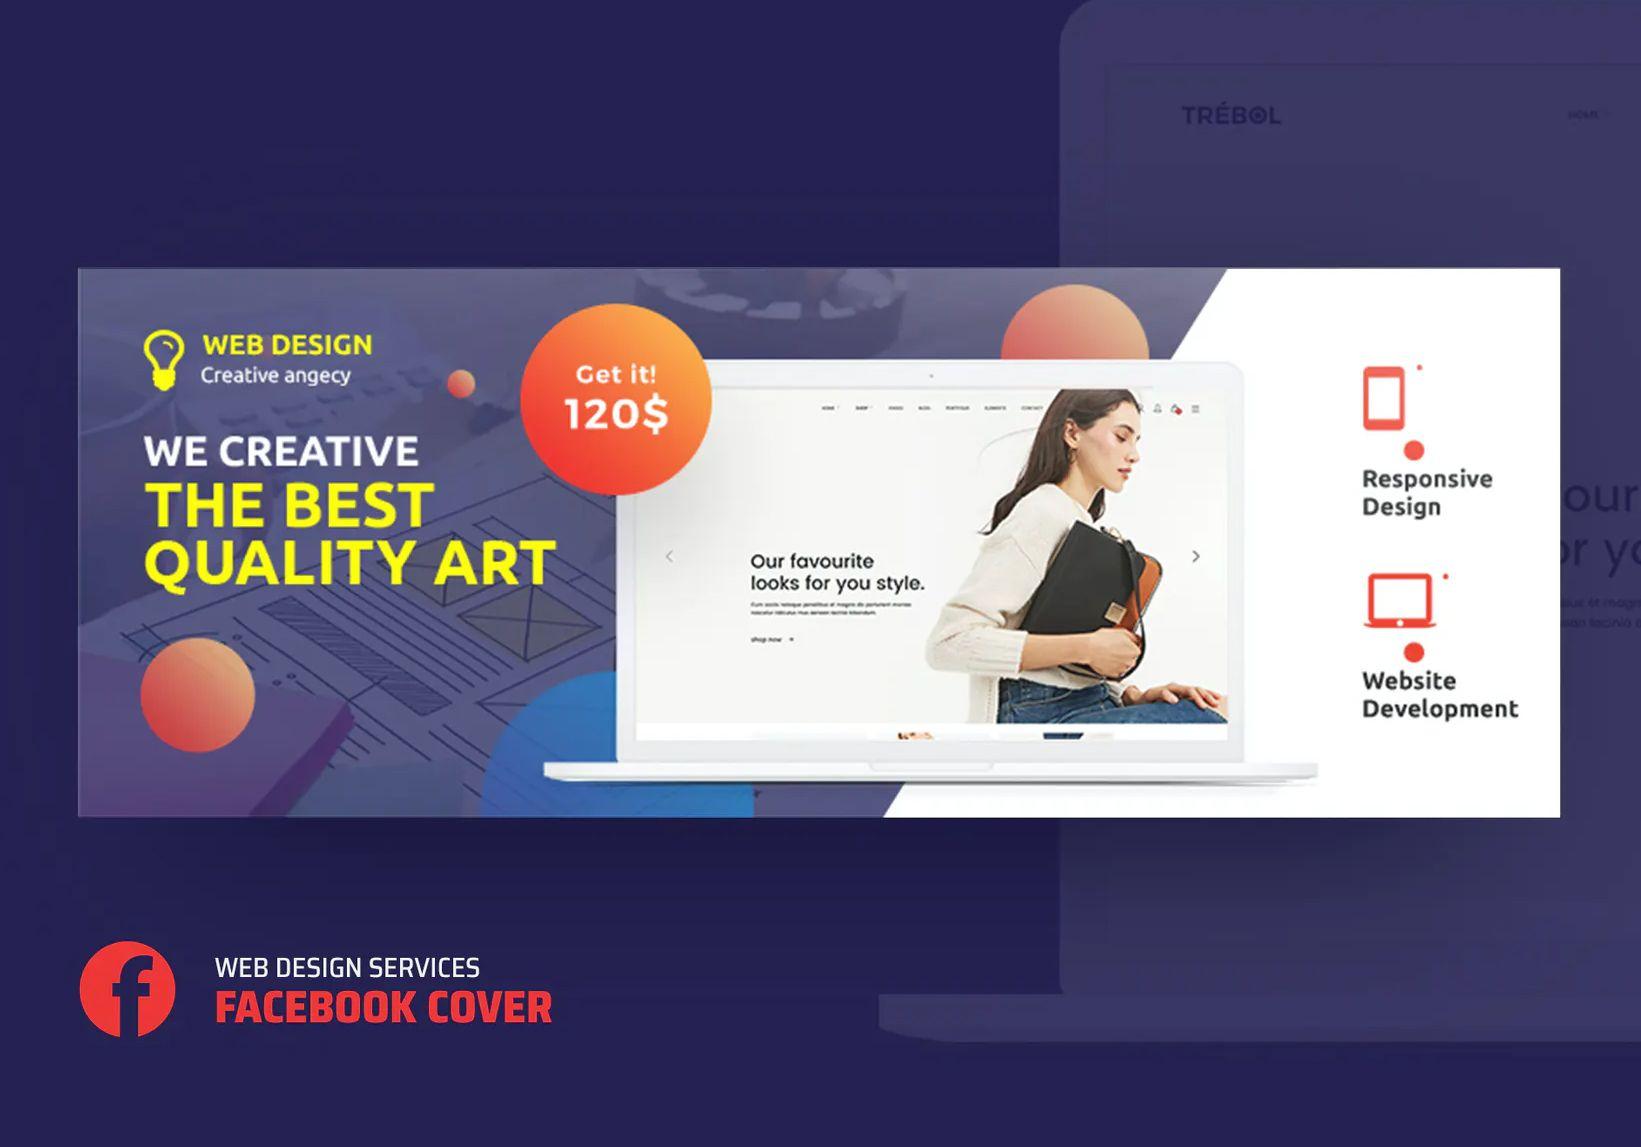 Web Design Services Facebook Cover Template Psd In 2020 Web Design Services Facebook Cover Template Web Design